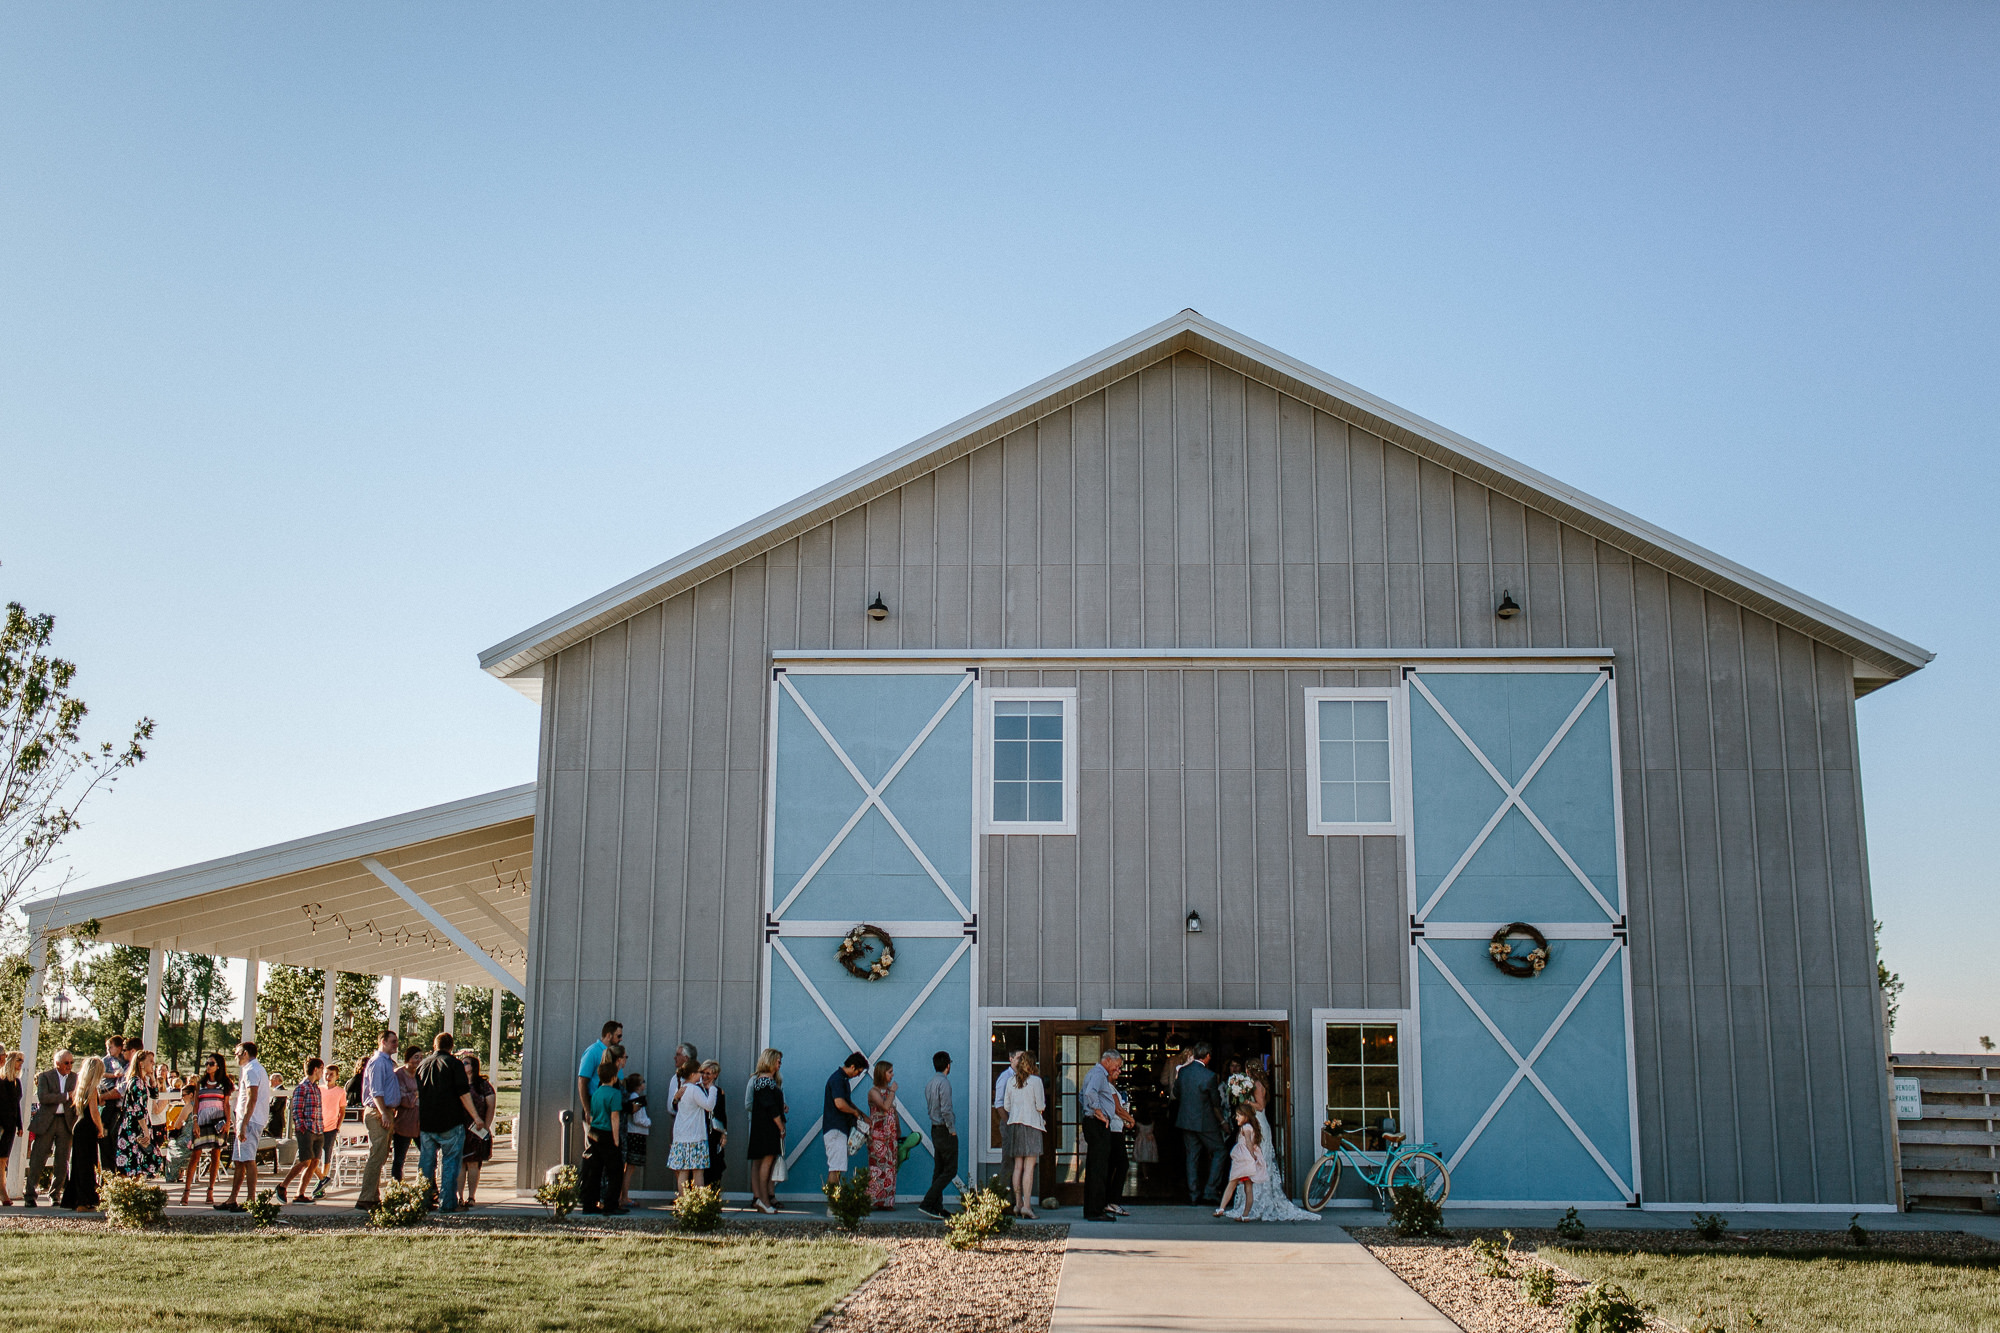 wedding-elopement-adventerous-romantic-timeless-south-dakota-blue-haven-barn-060.jpg